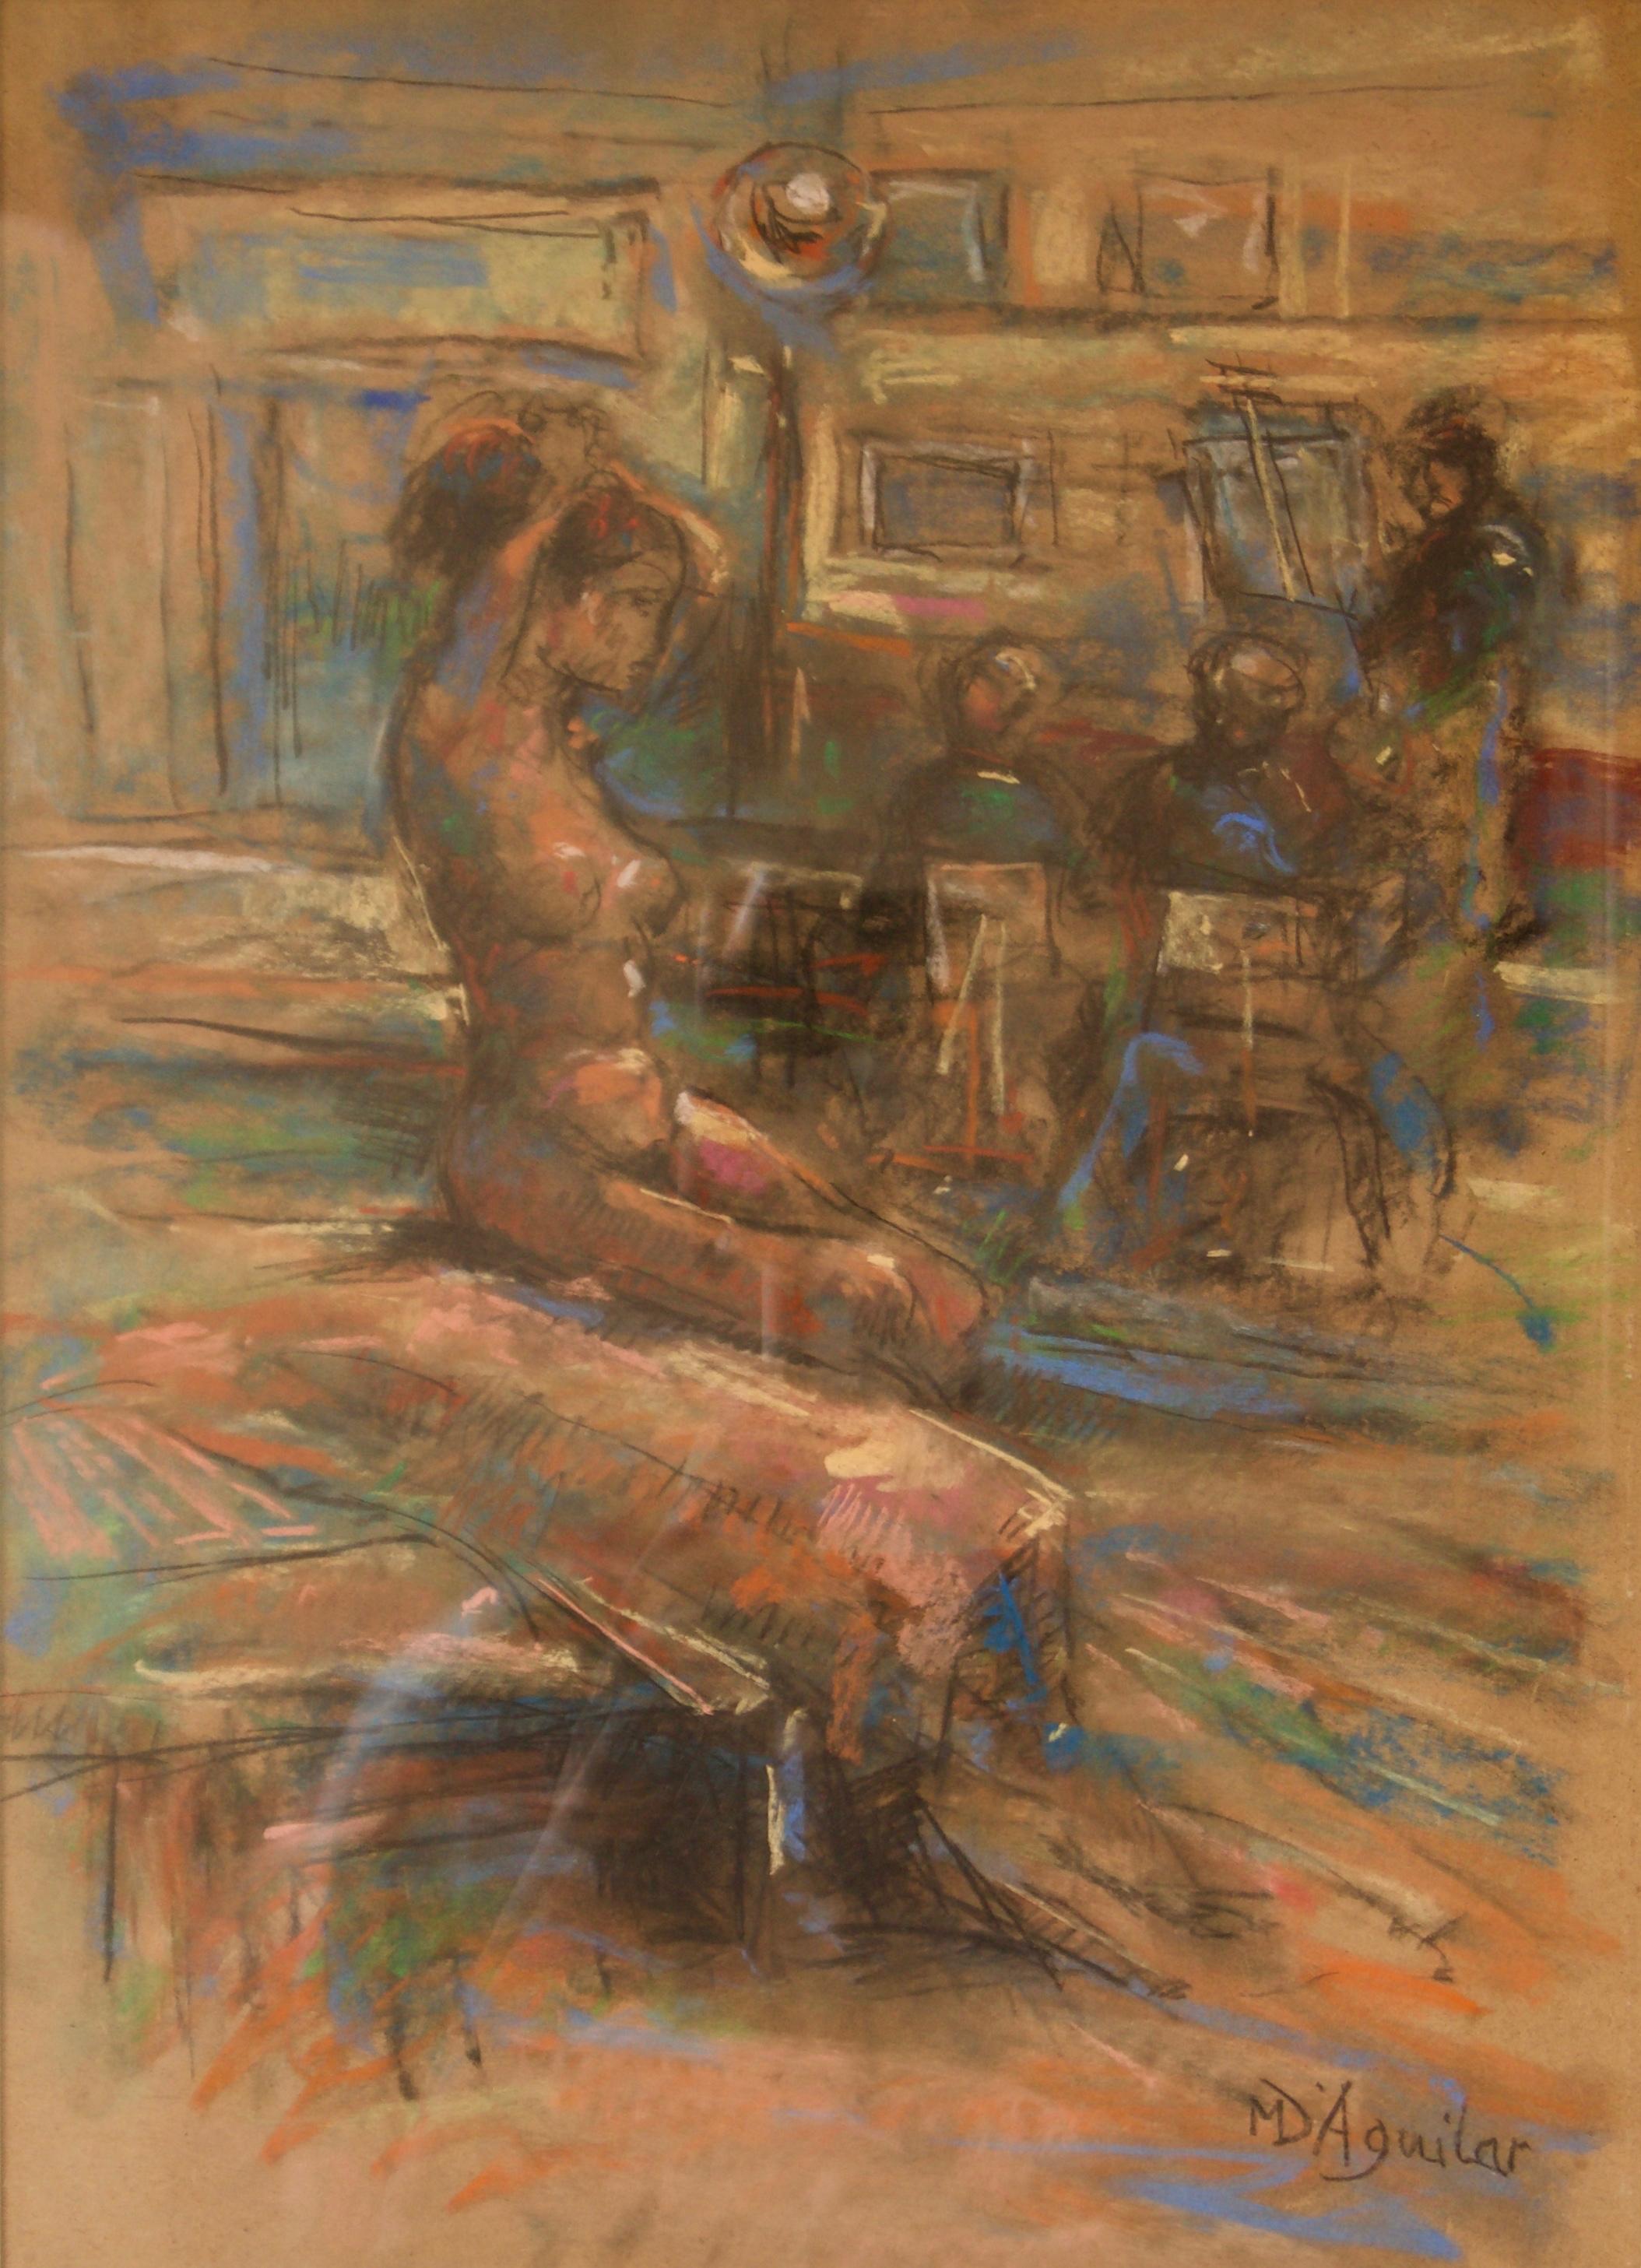 Dans L'Atelier Mardi - Mid 20th Century Nude Still Life Oil by Michael D'Aguilar